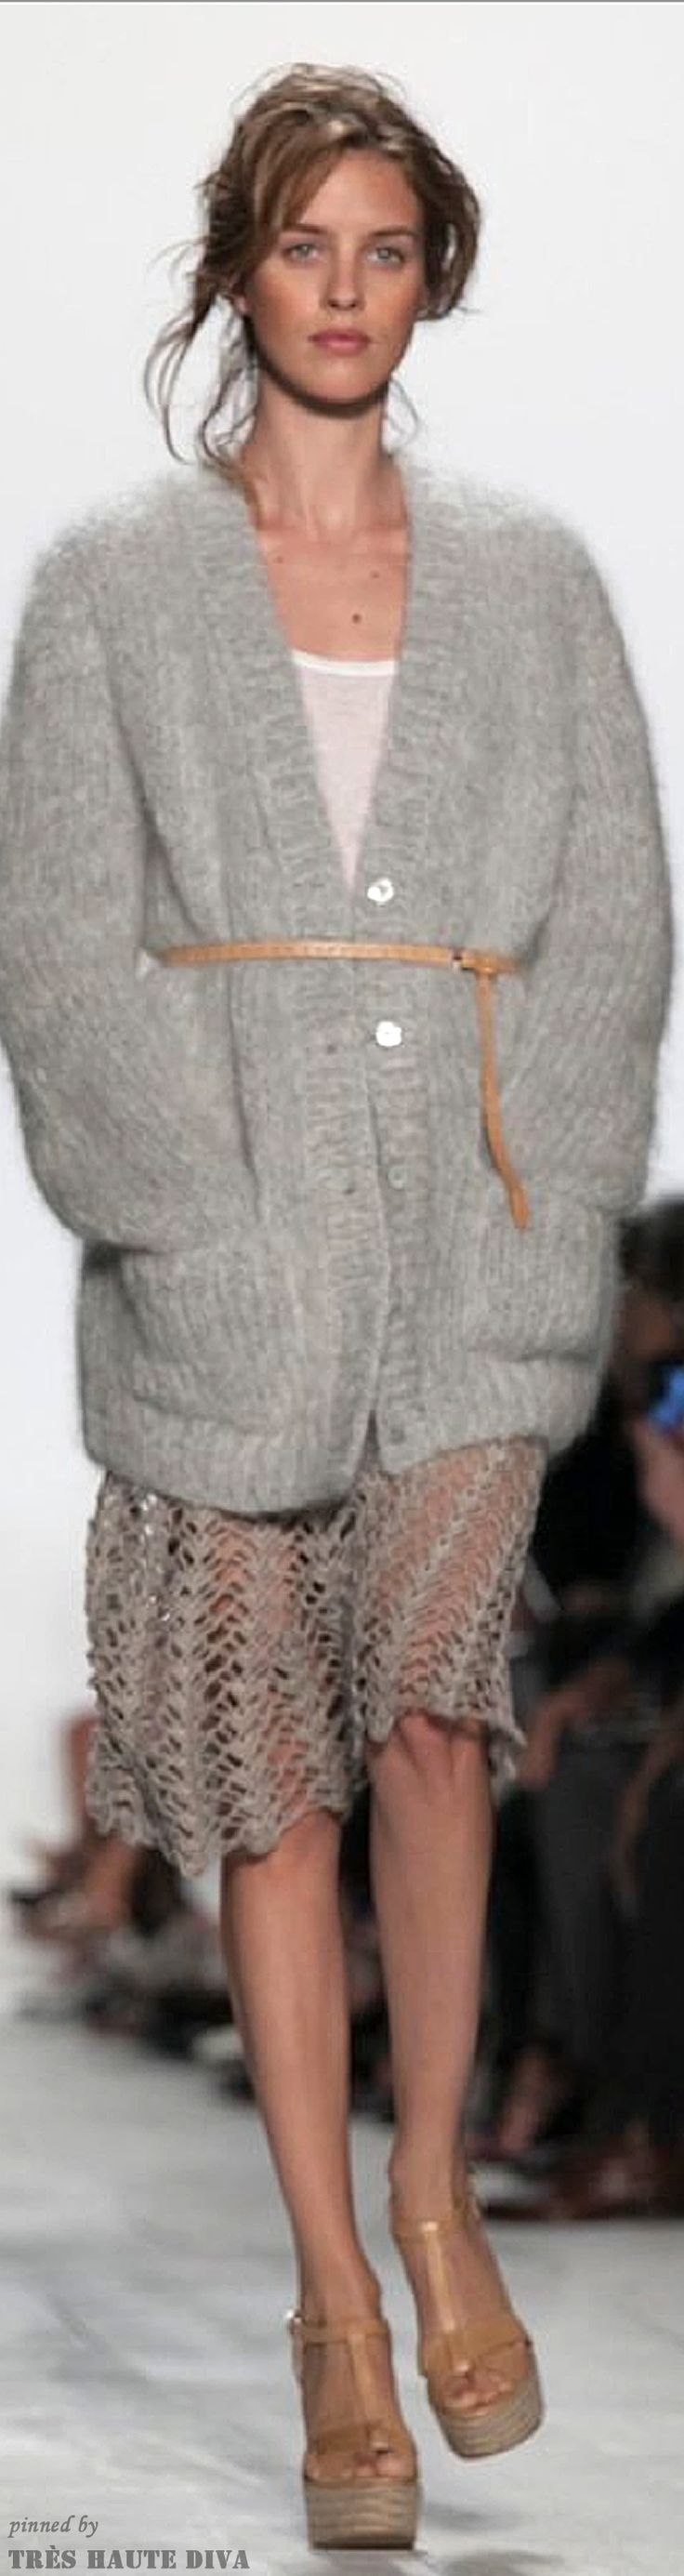 -NYFW Michael Kors Spring 2014 RTW http://www.nytimes.com/fashion. <3